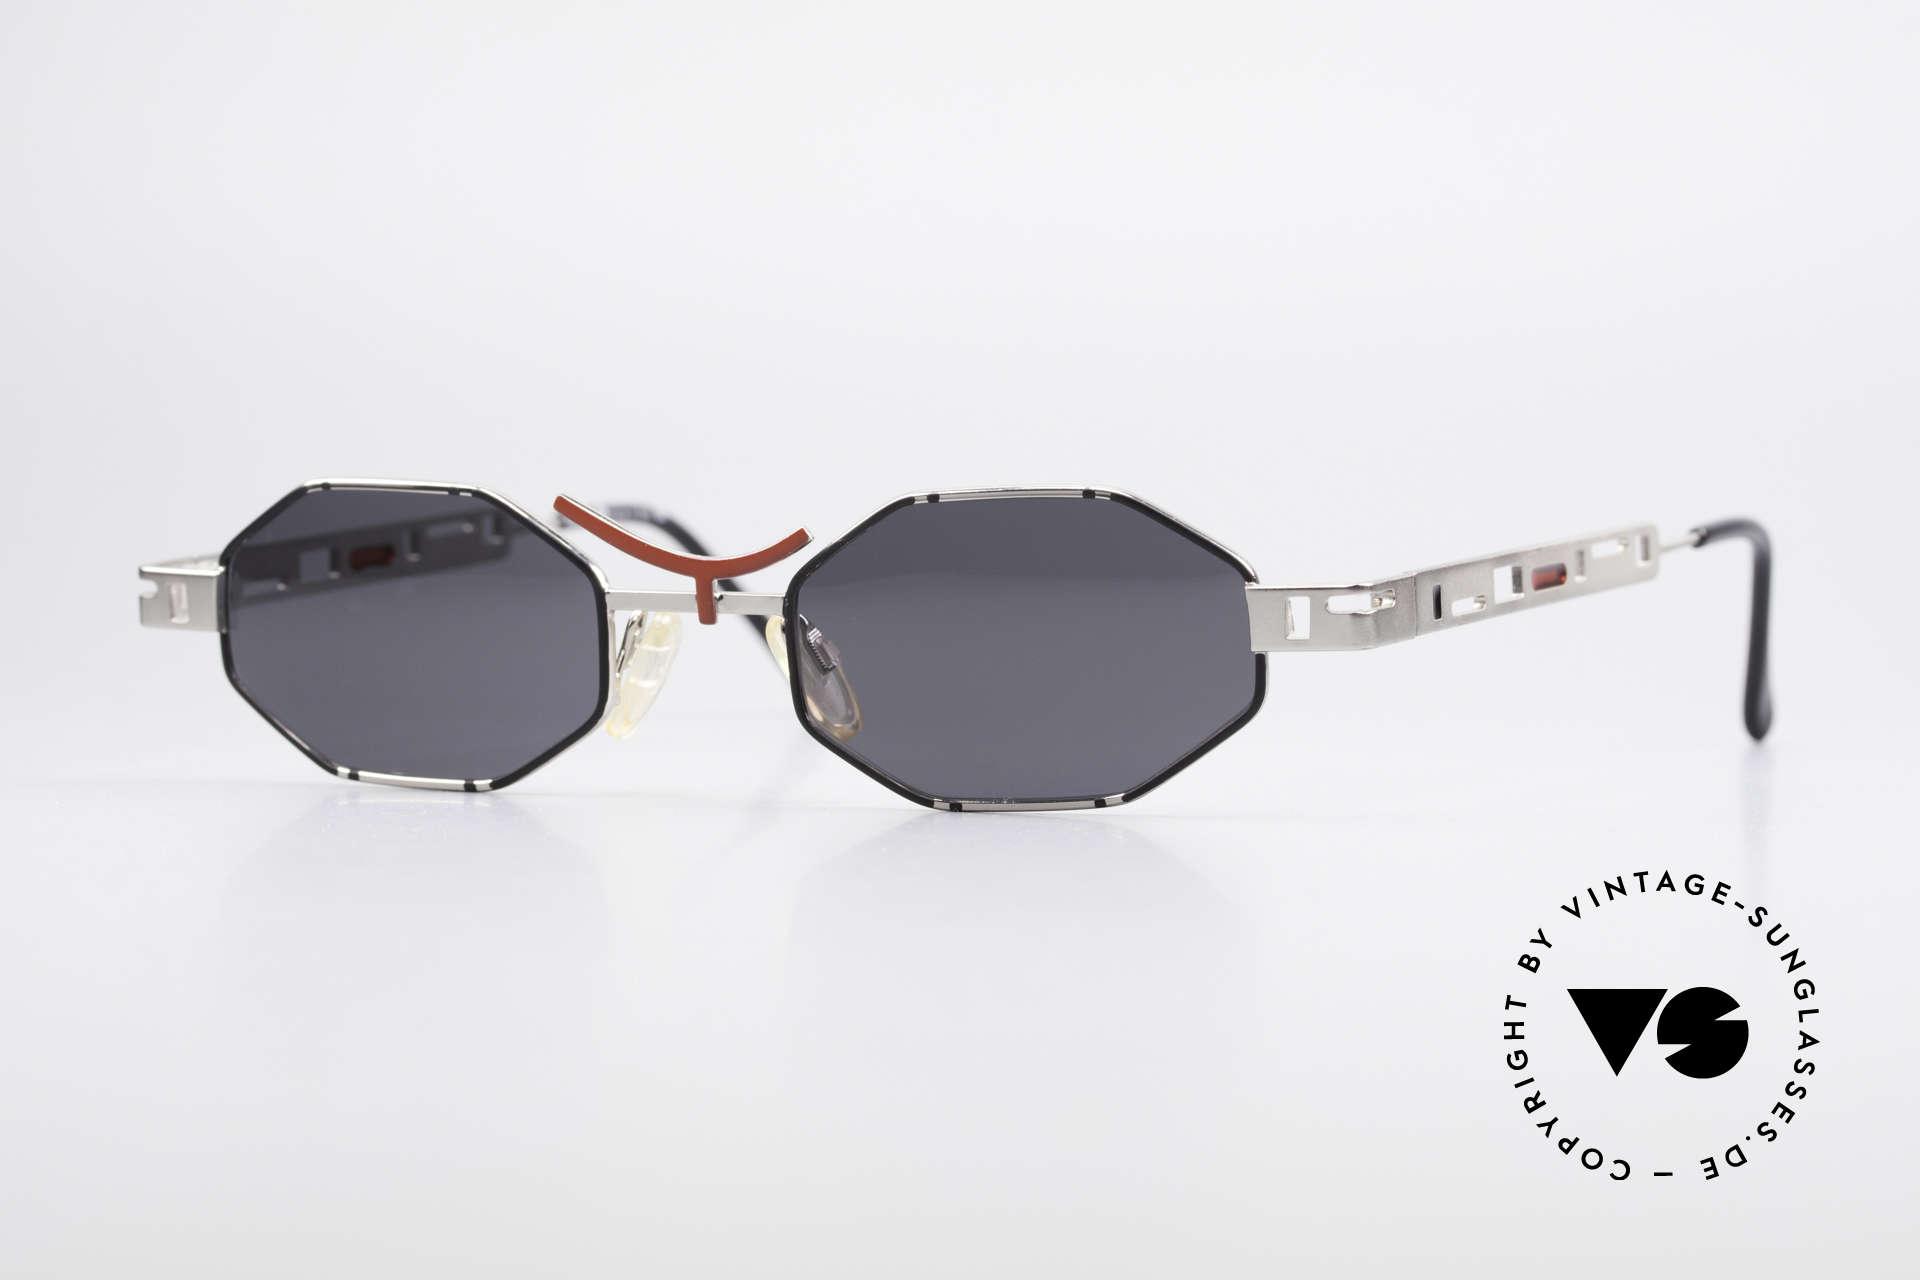 Casanova CLC2 Industrial Steampunk Shades, very interesting vintage 80's sunglasses by CASANOVA, Made for Men and Women